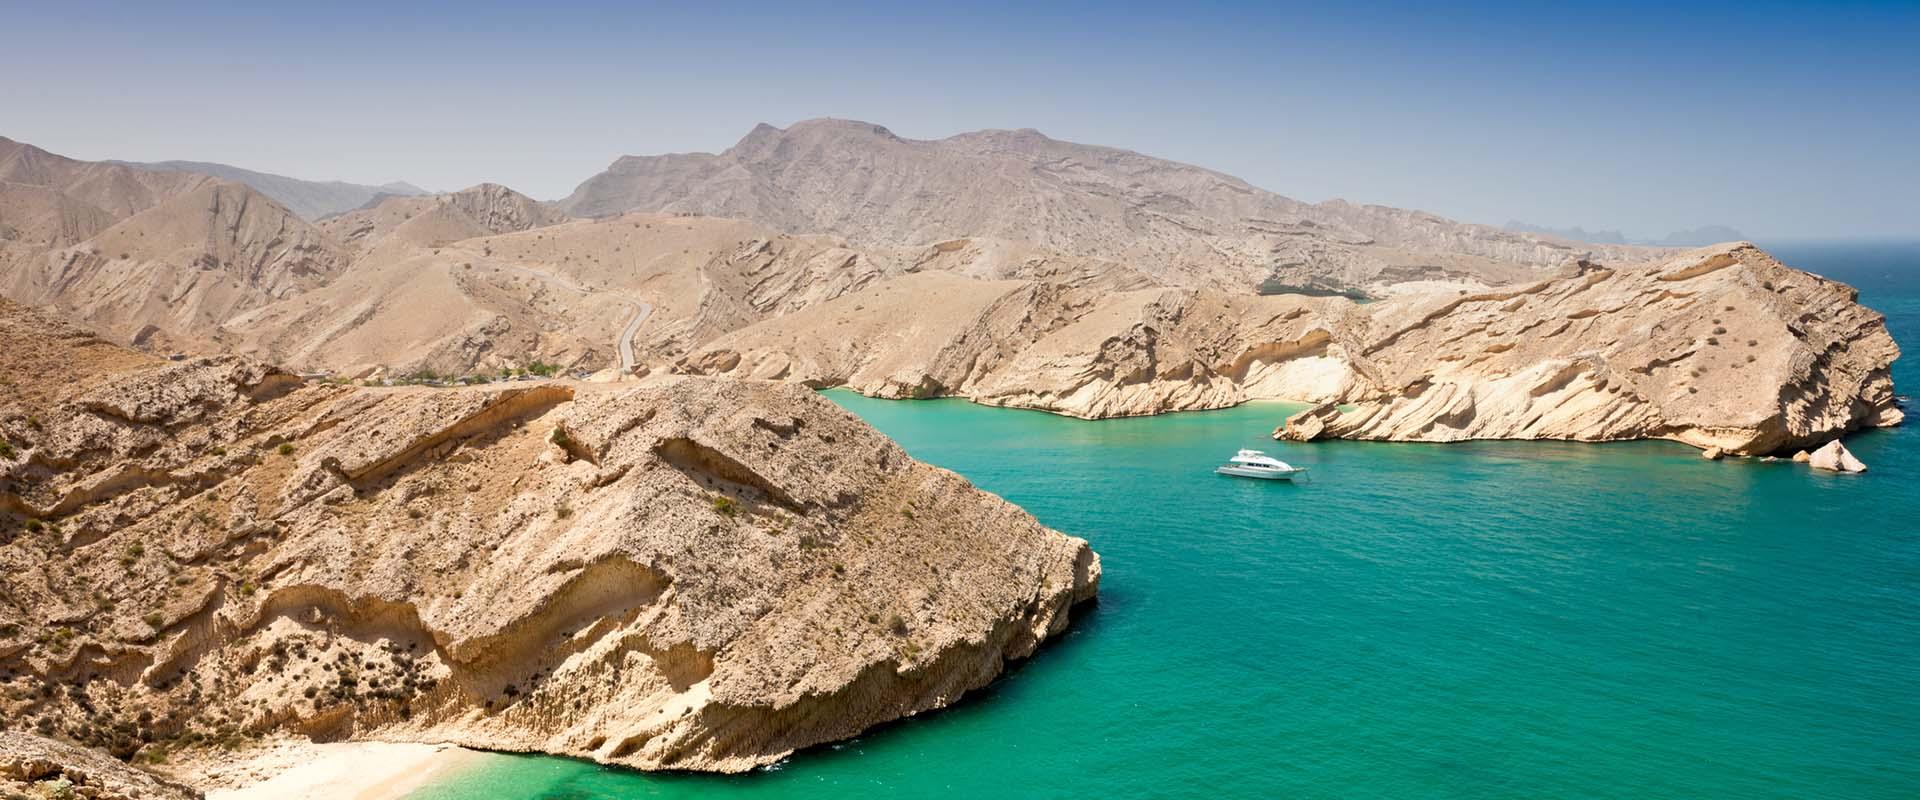 Great Oman Eid Al-Fitr 2018 - Oman_2018_Output  Picture_6223 .jpg